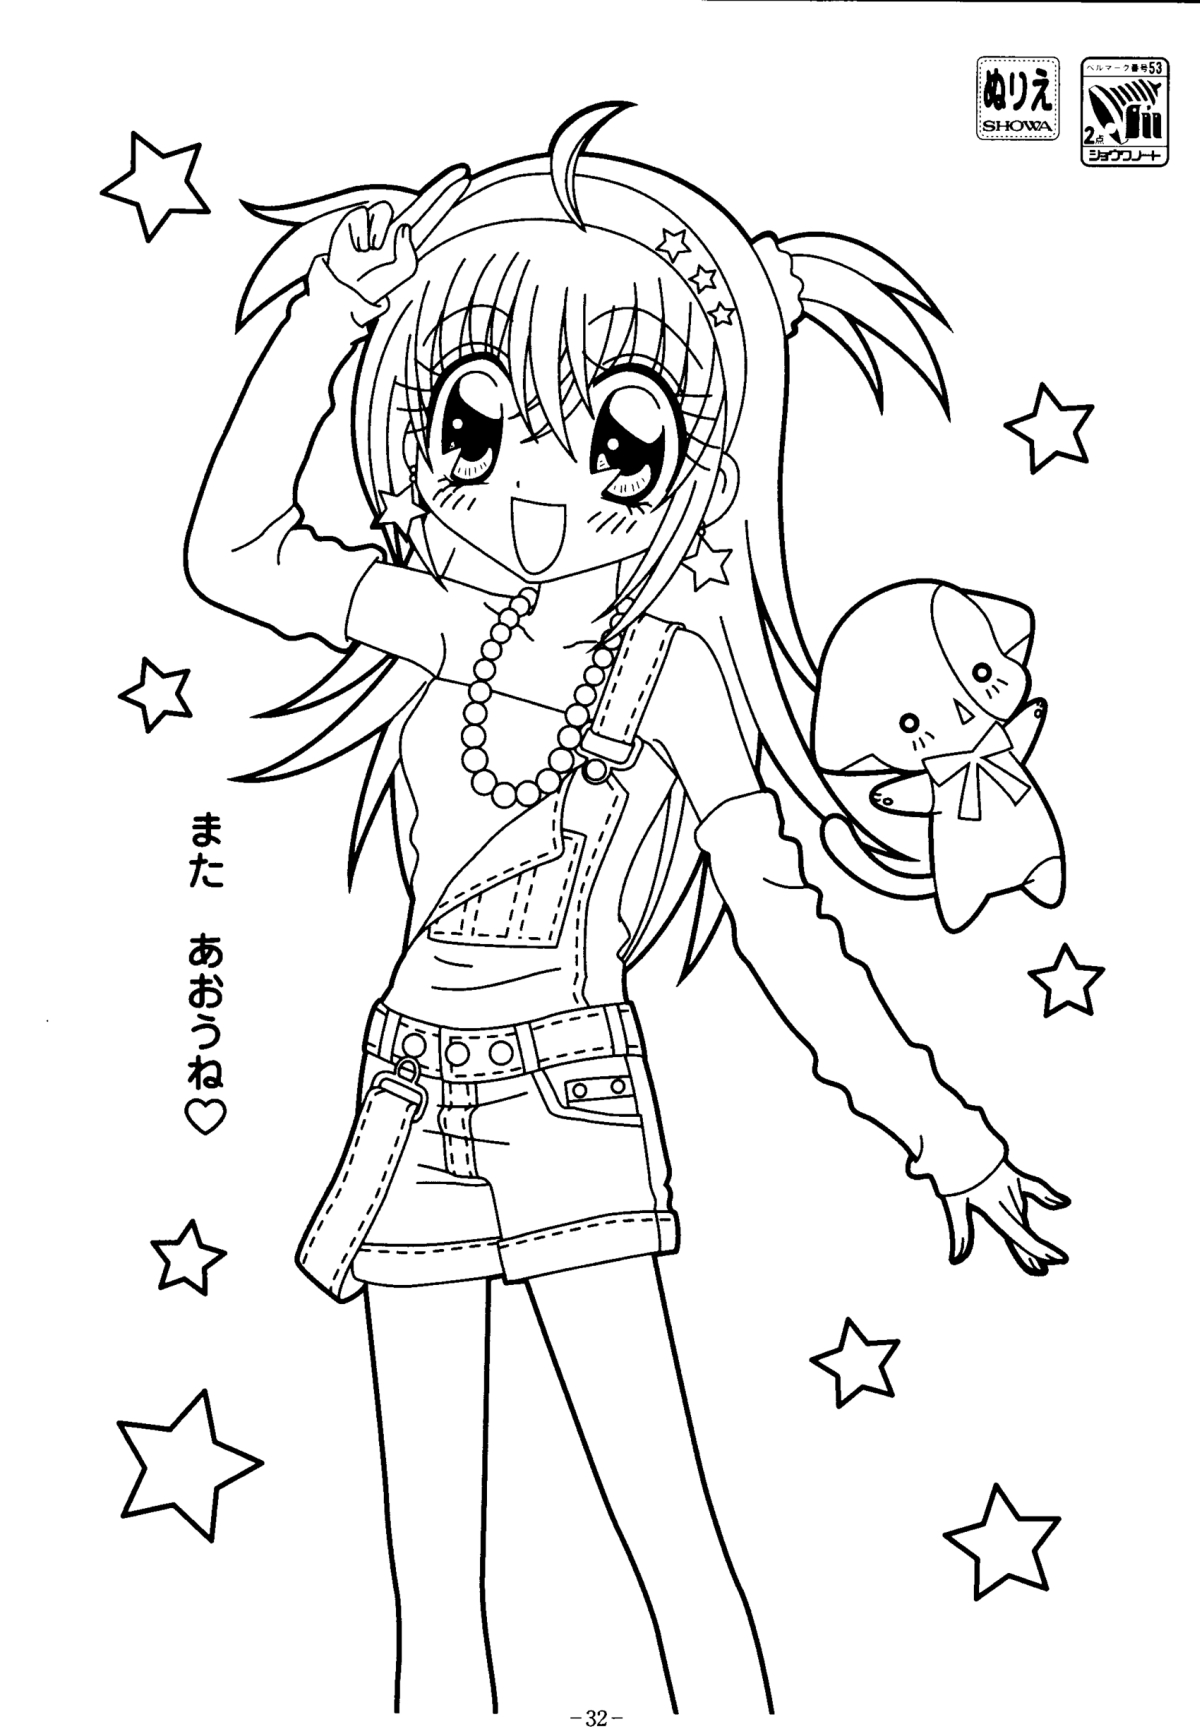 Coloriage Manga Kilari Et Les Ships | 30000 ++ collections ...